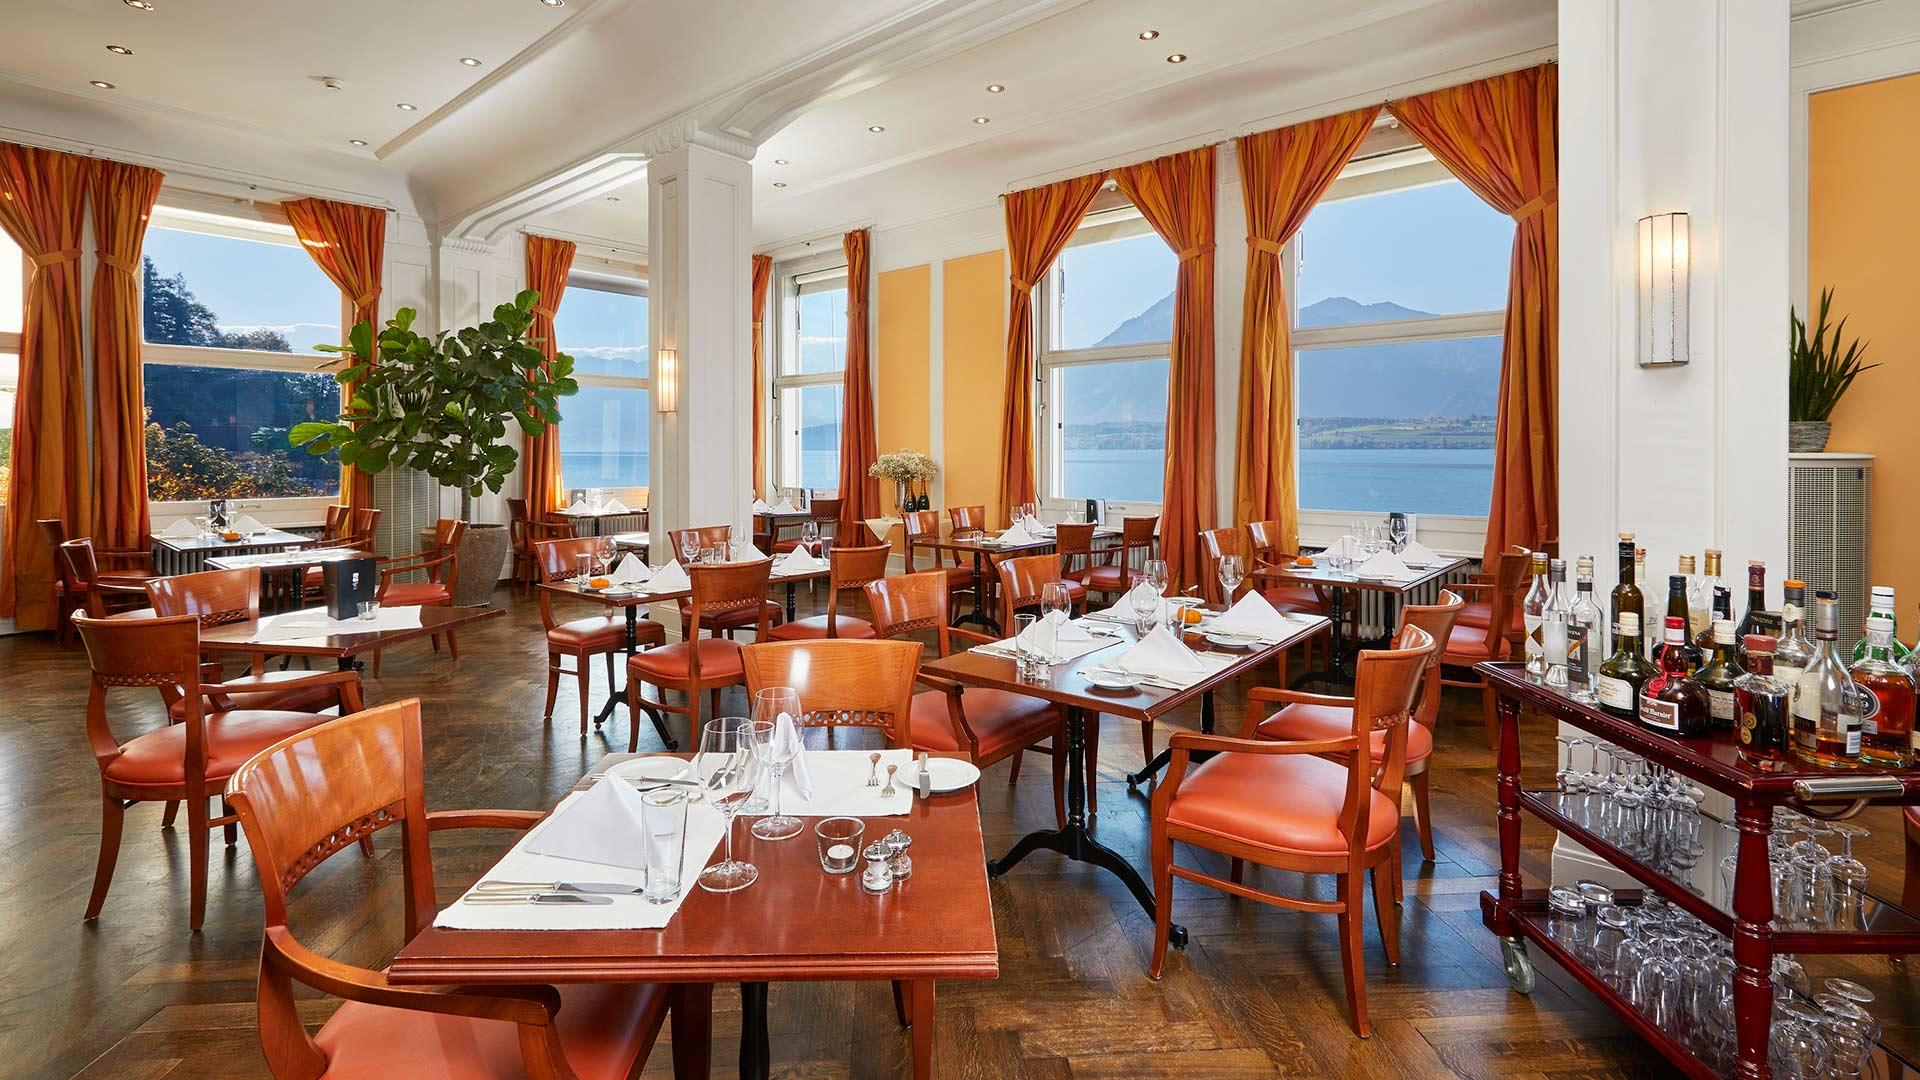 bellevue-au-lac-restaurant-ambiance